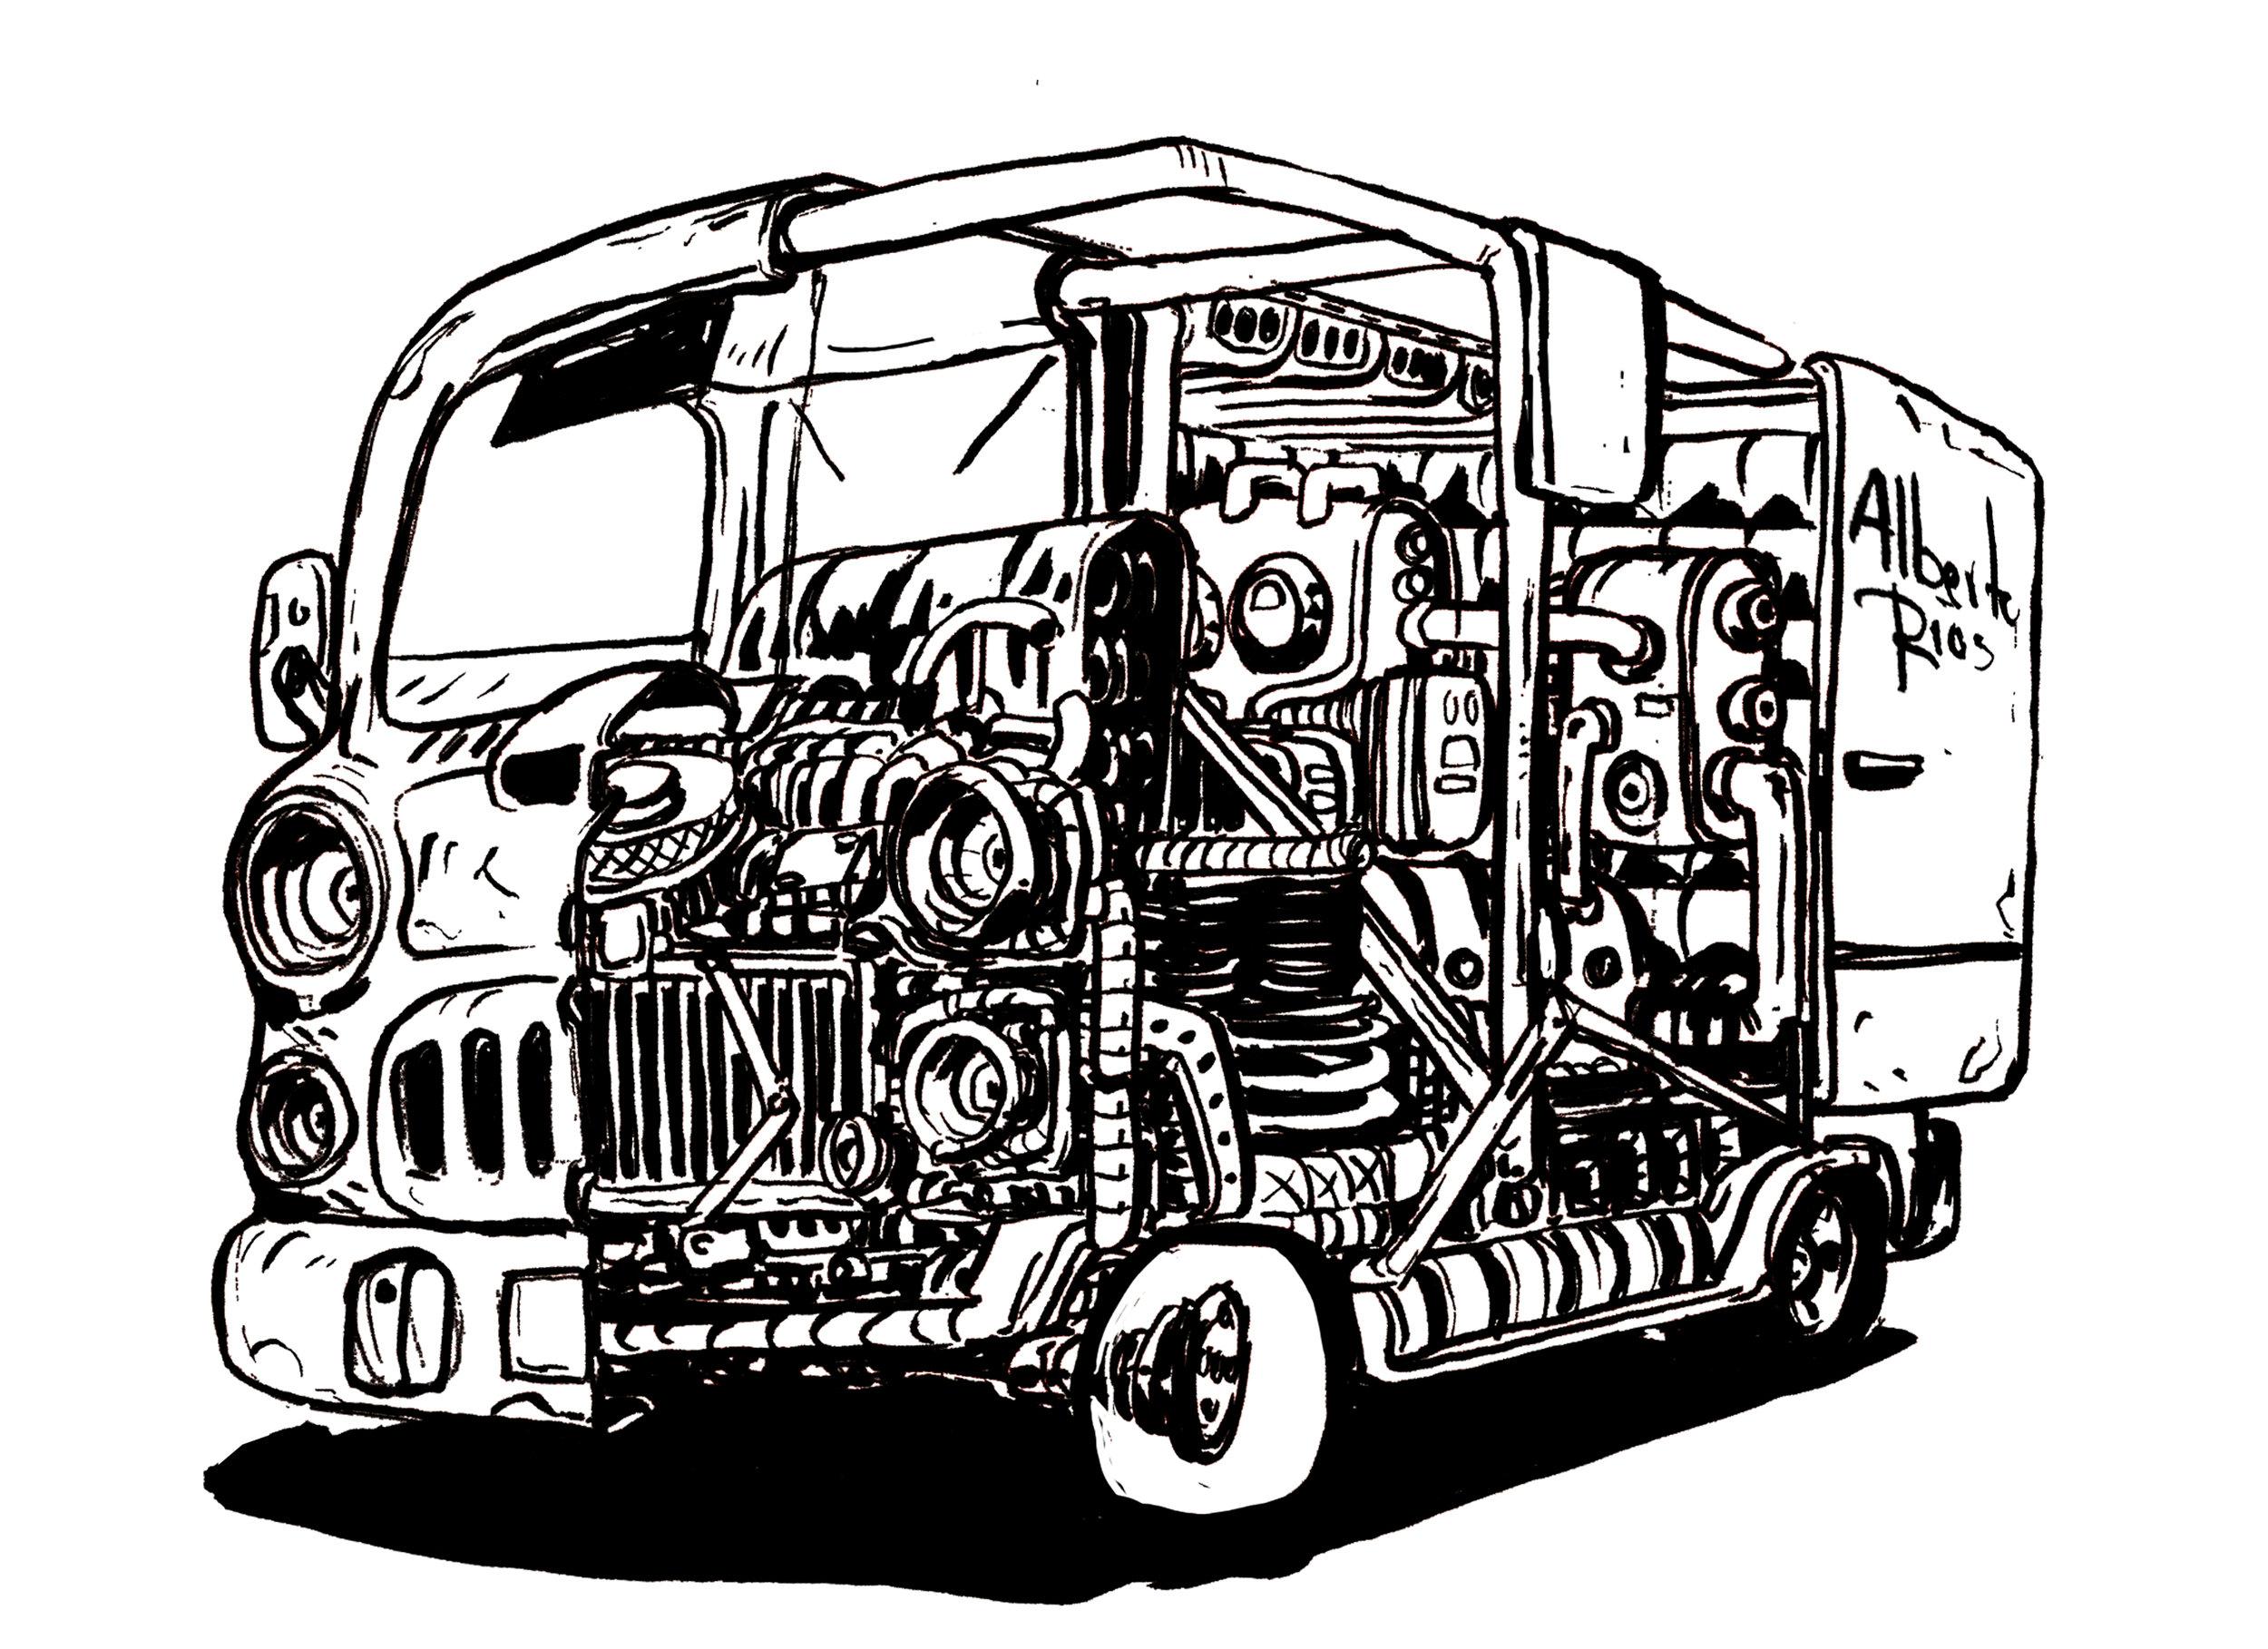 rotonukervan2.jpg